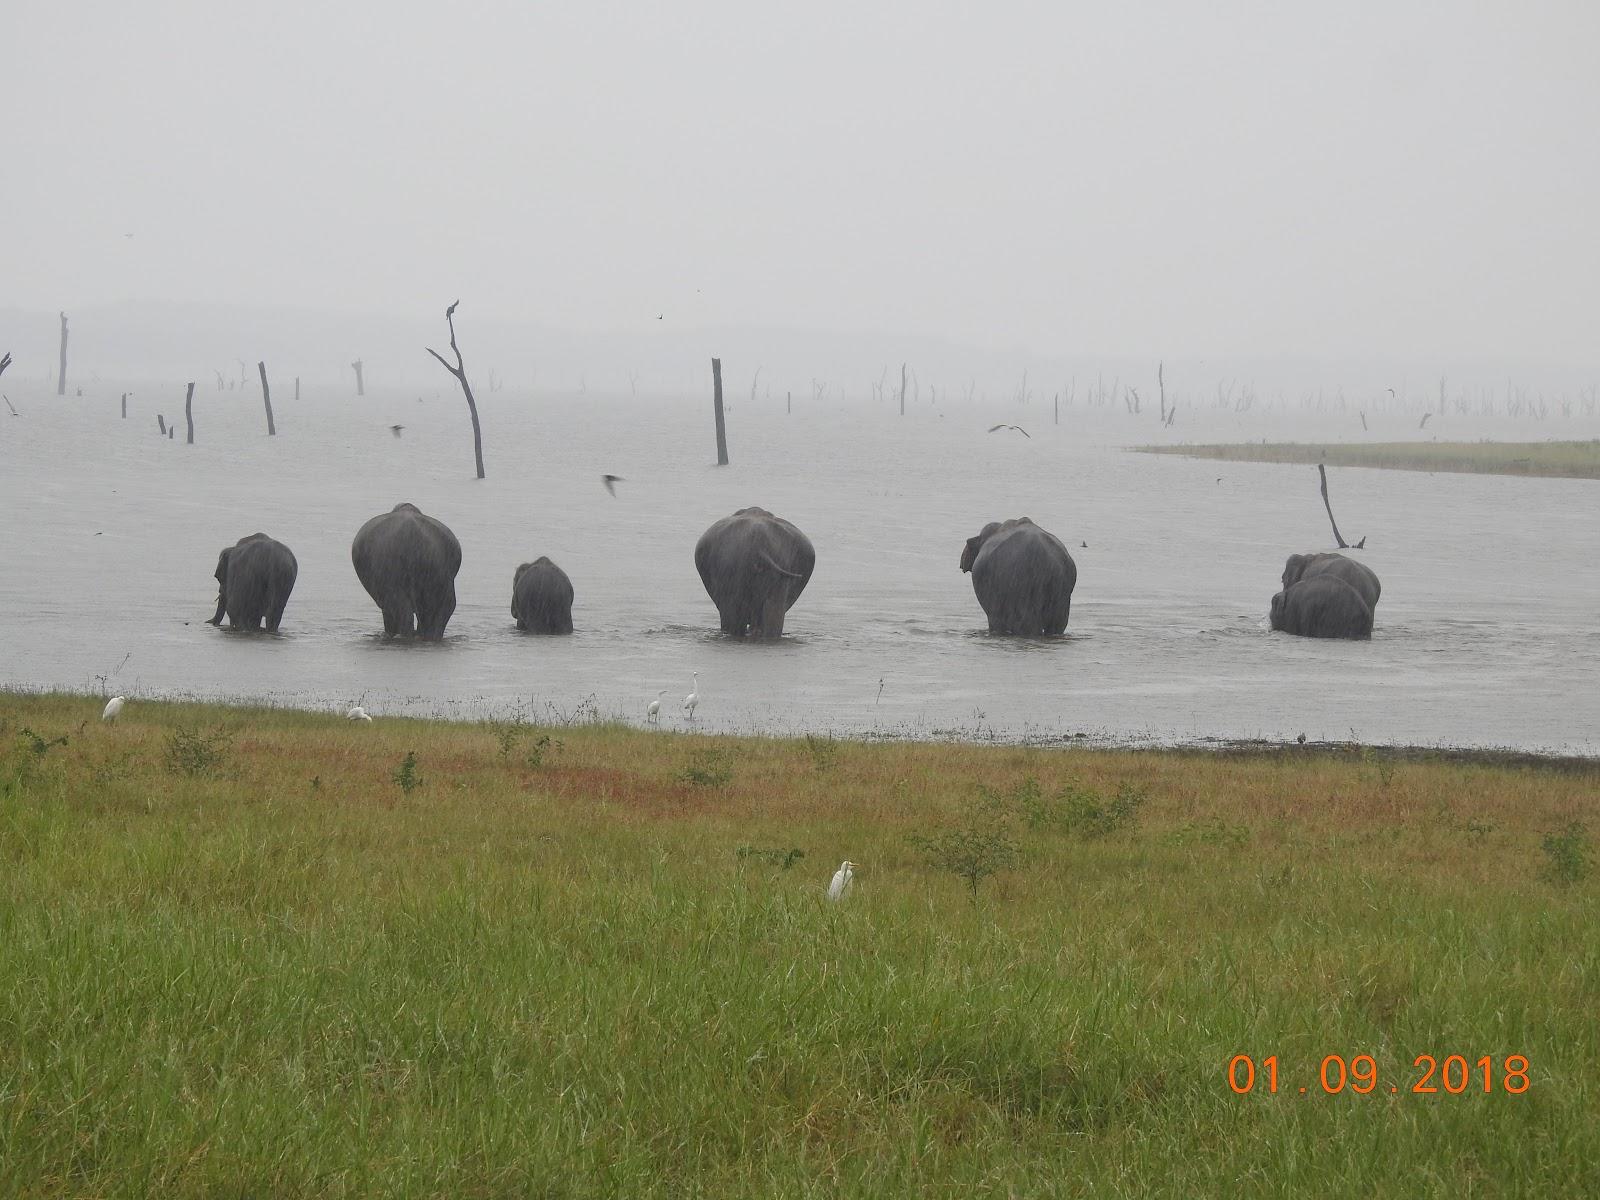 invite-to-paradise-sri-lanka-maldives-holiday-specialists-nutan-vidyut-patel-elephants-3.jpg